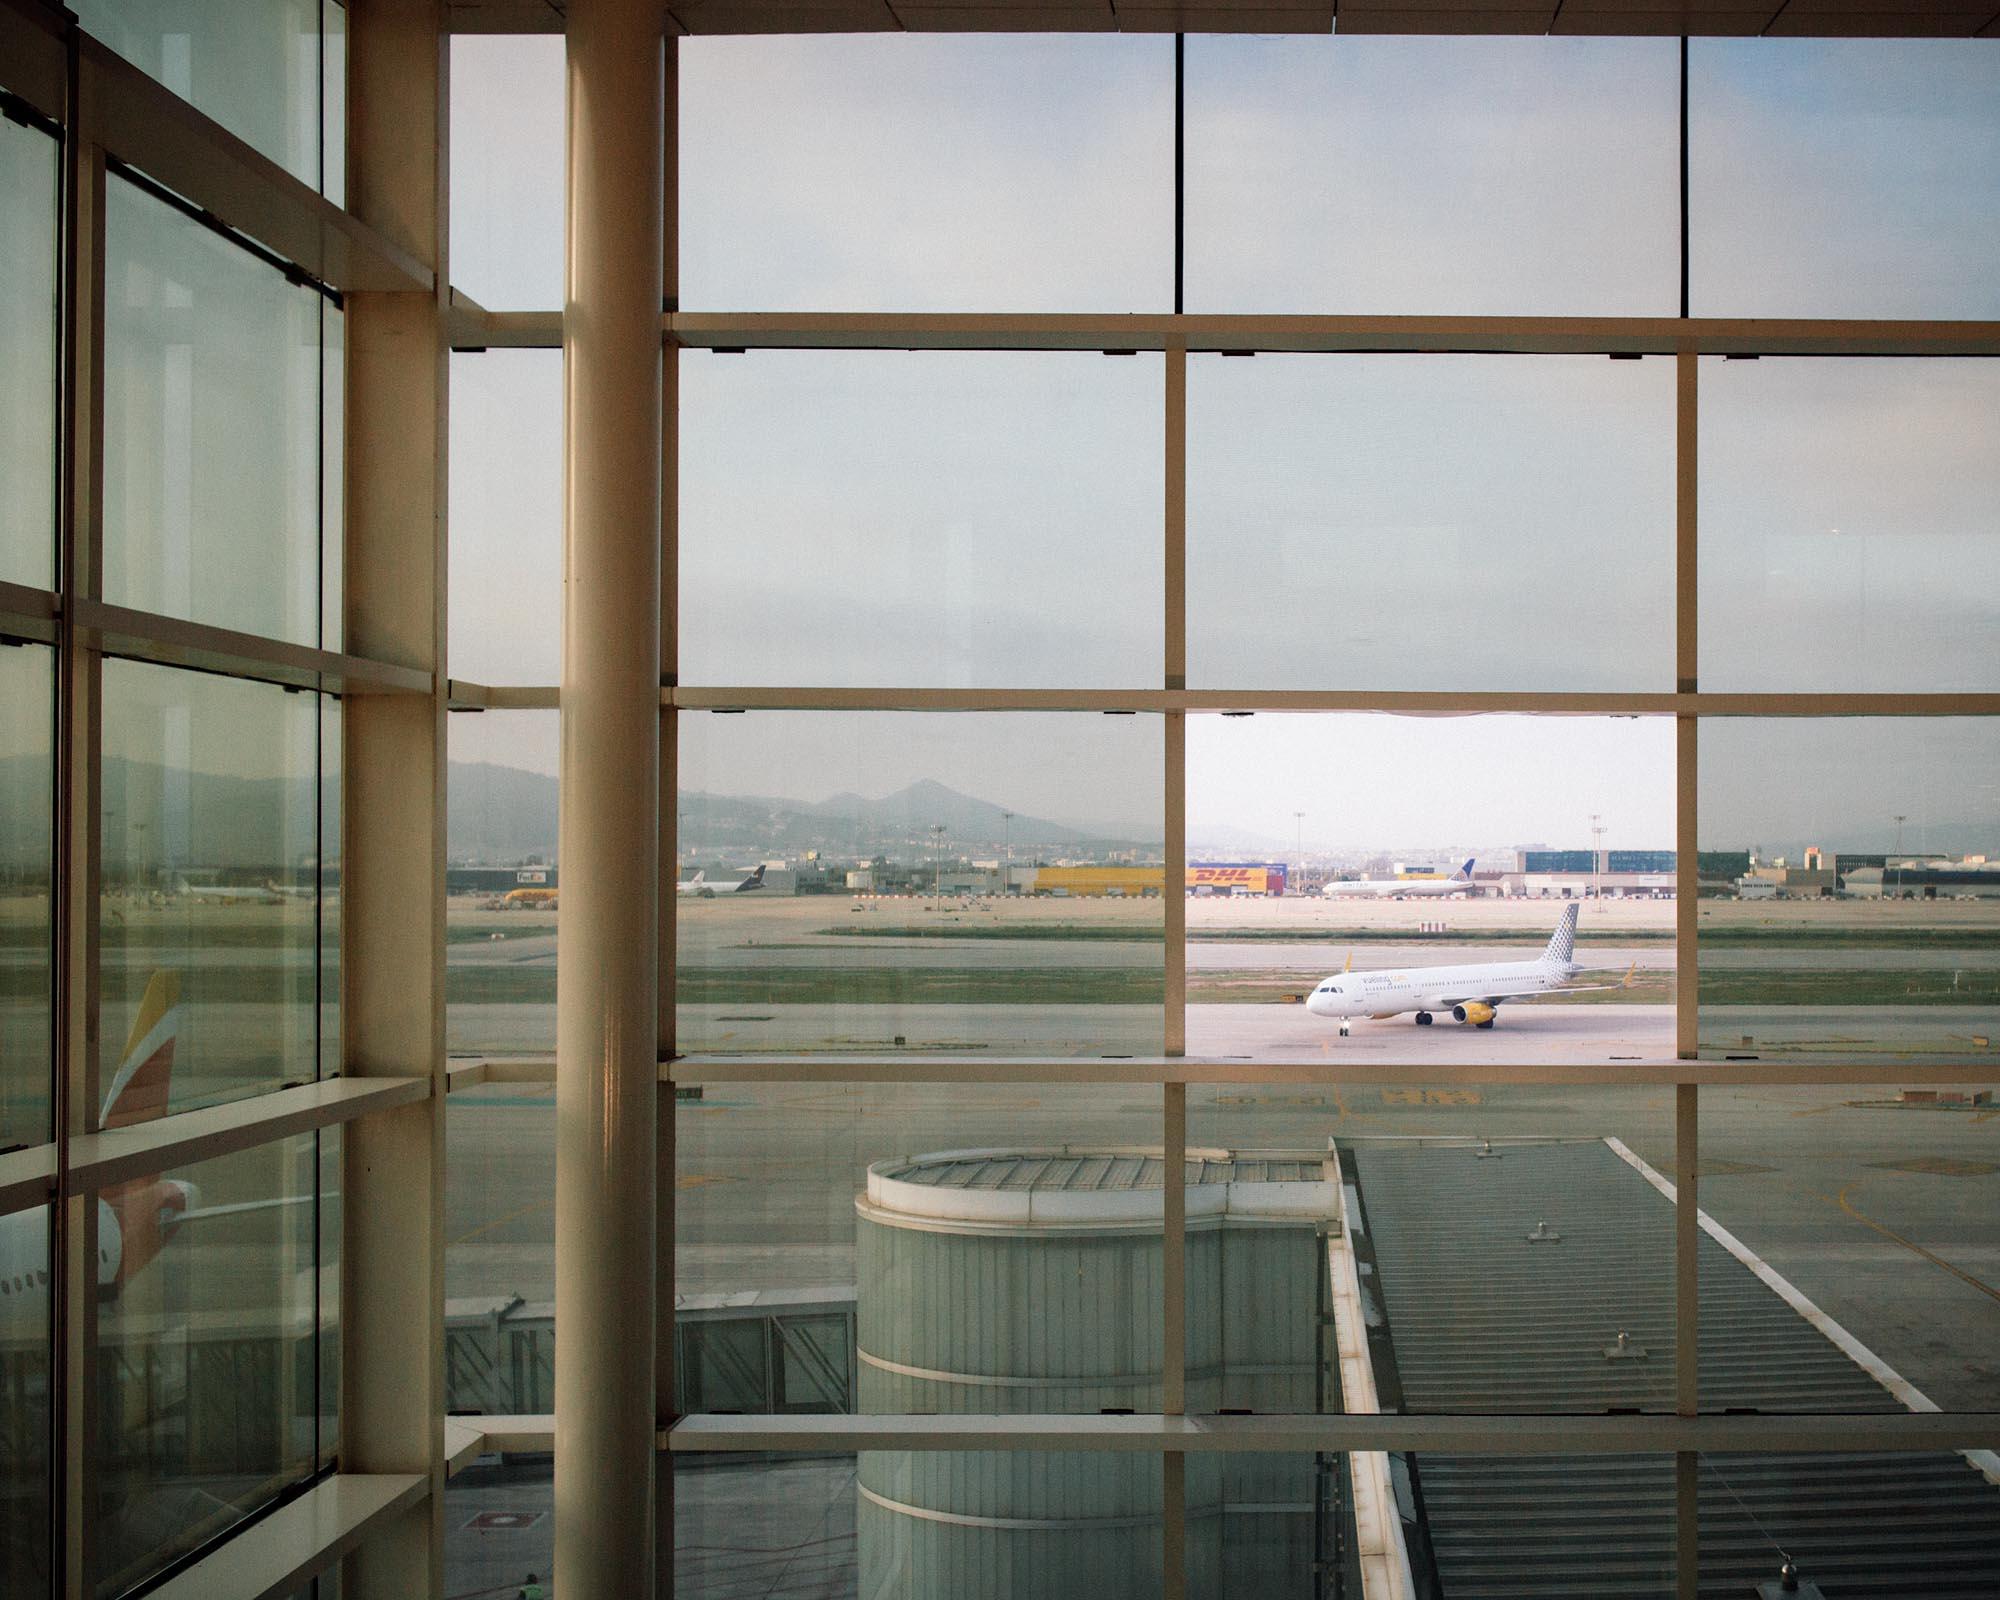 Aeroport de Barcelona – el Prat